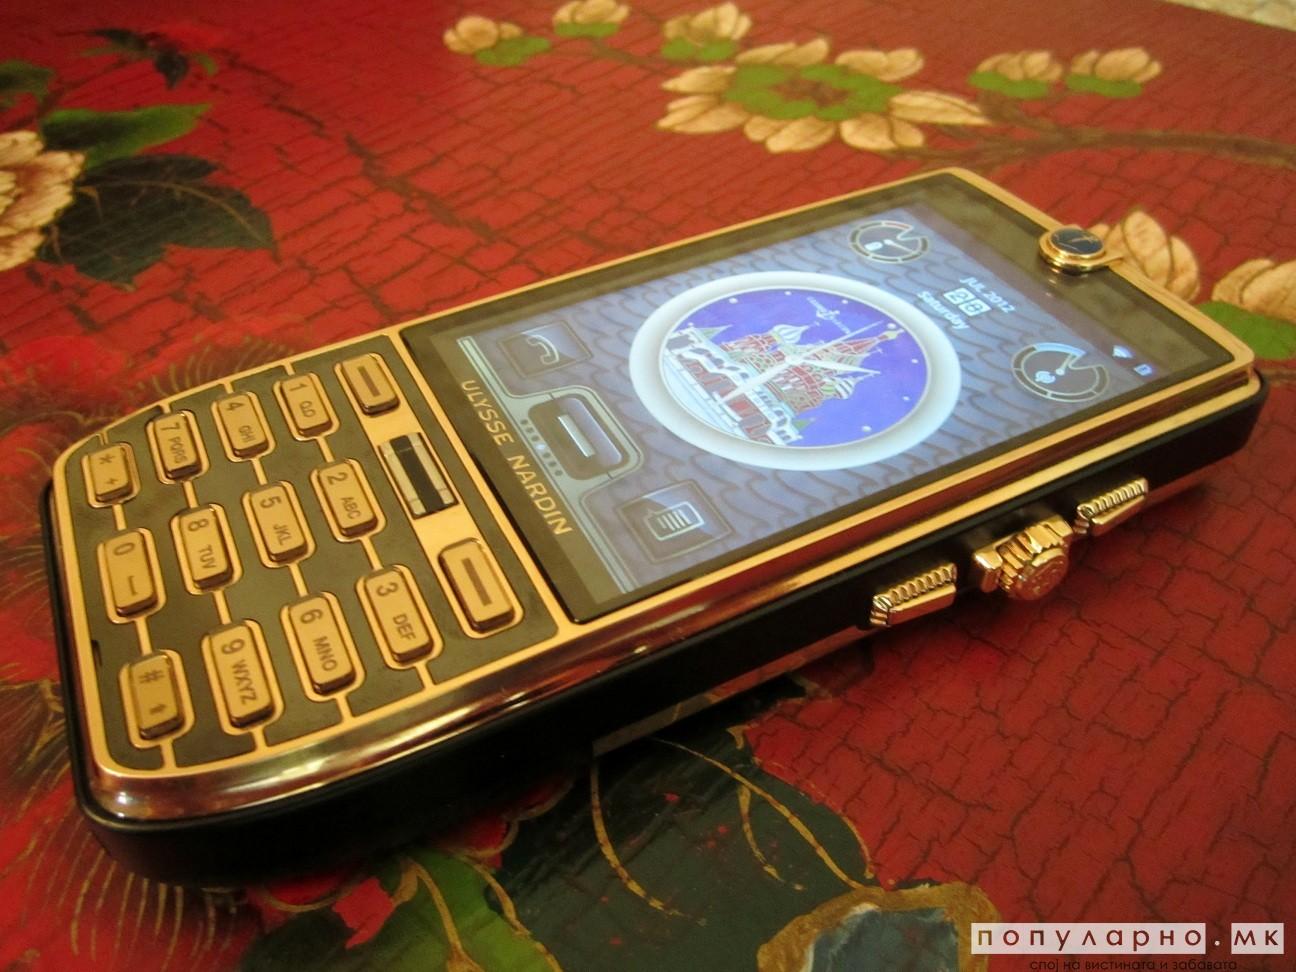 Телефон од злато и сафири кој чини 22 илјади долари